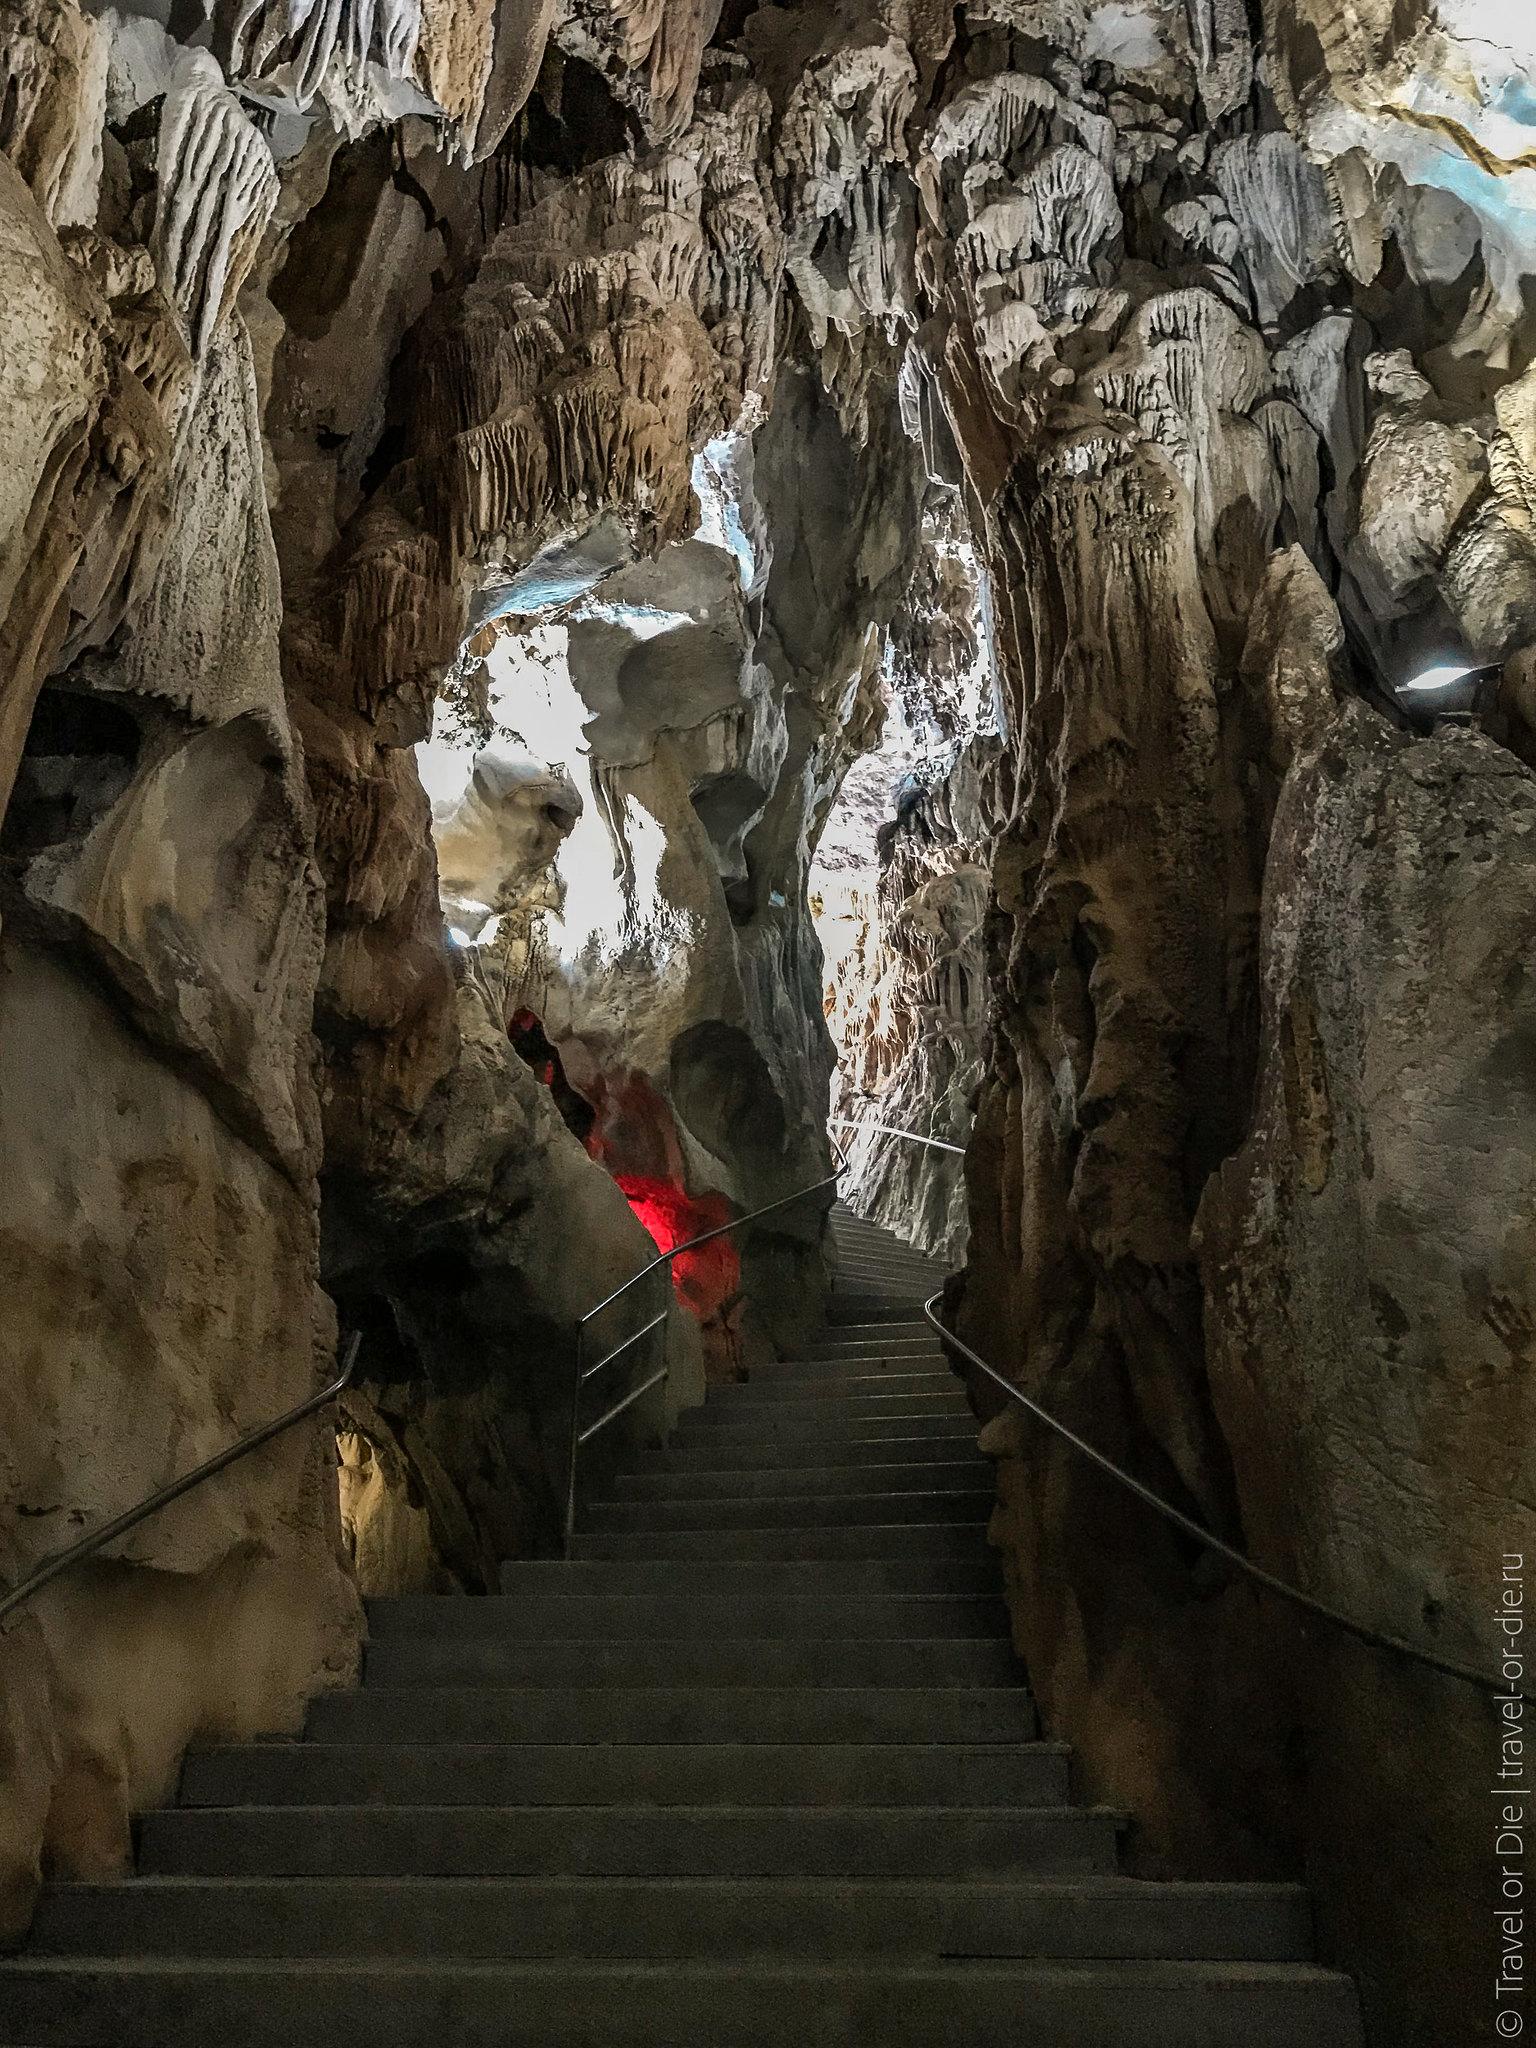 Sapadere-Canyon-Tour-экскурсия-в-каньон-сападере-8482